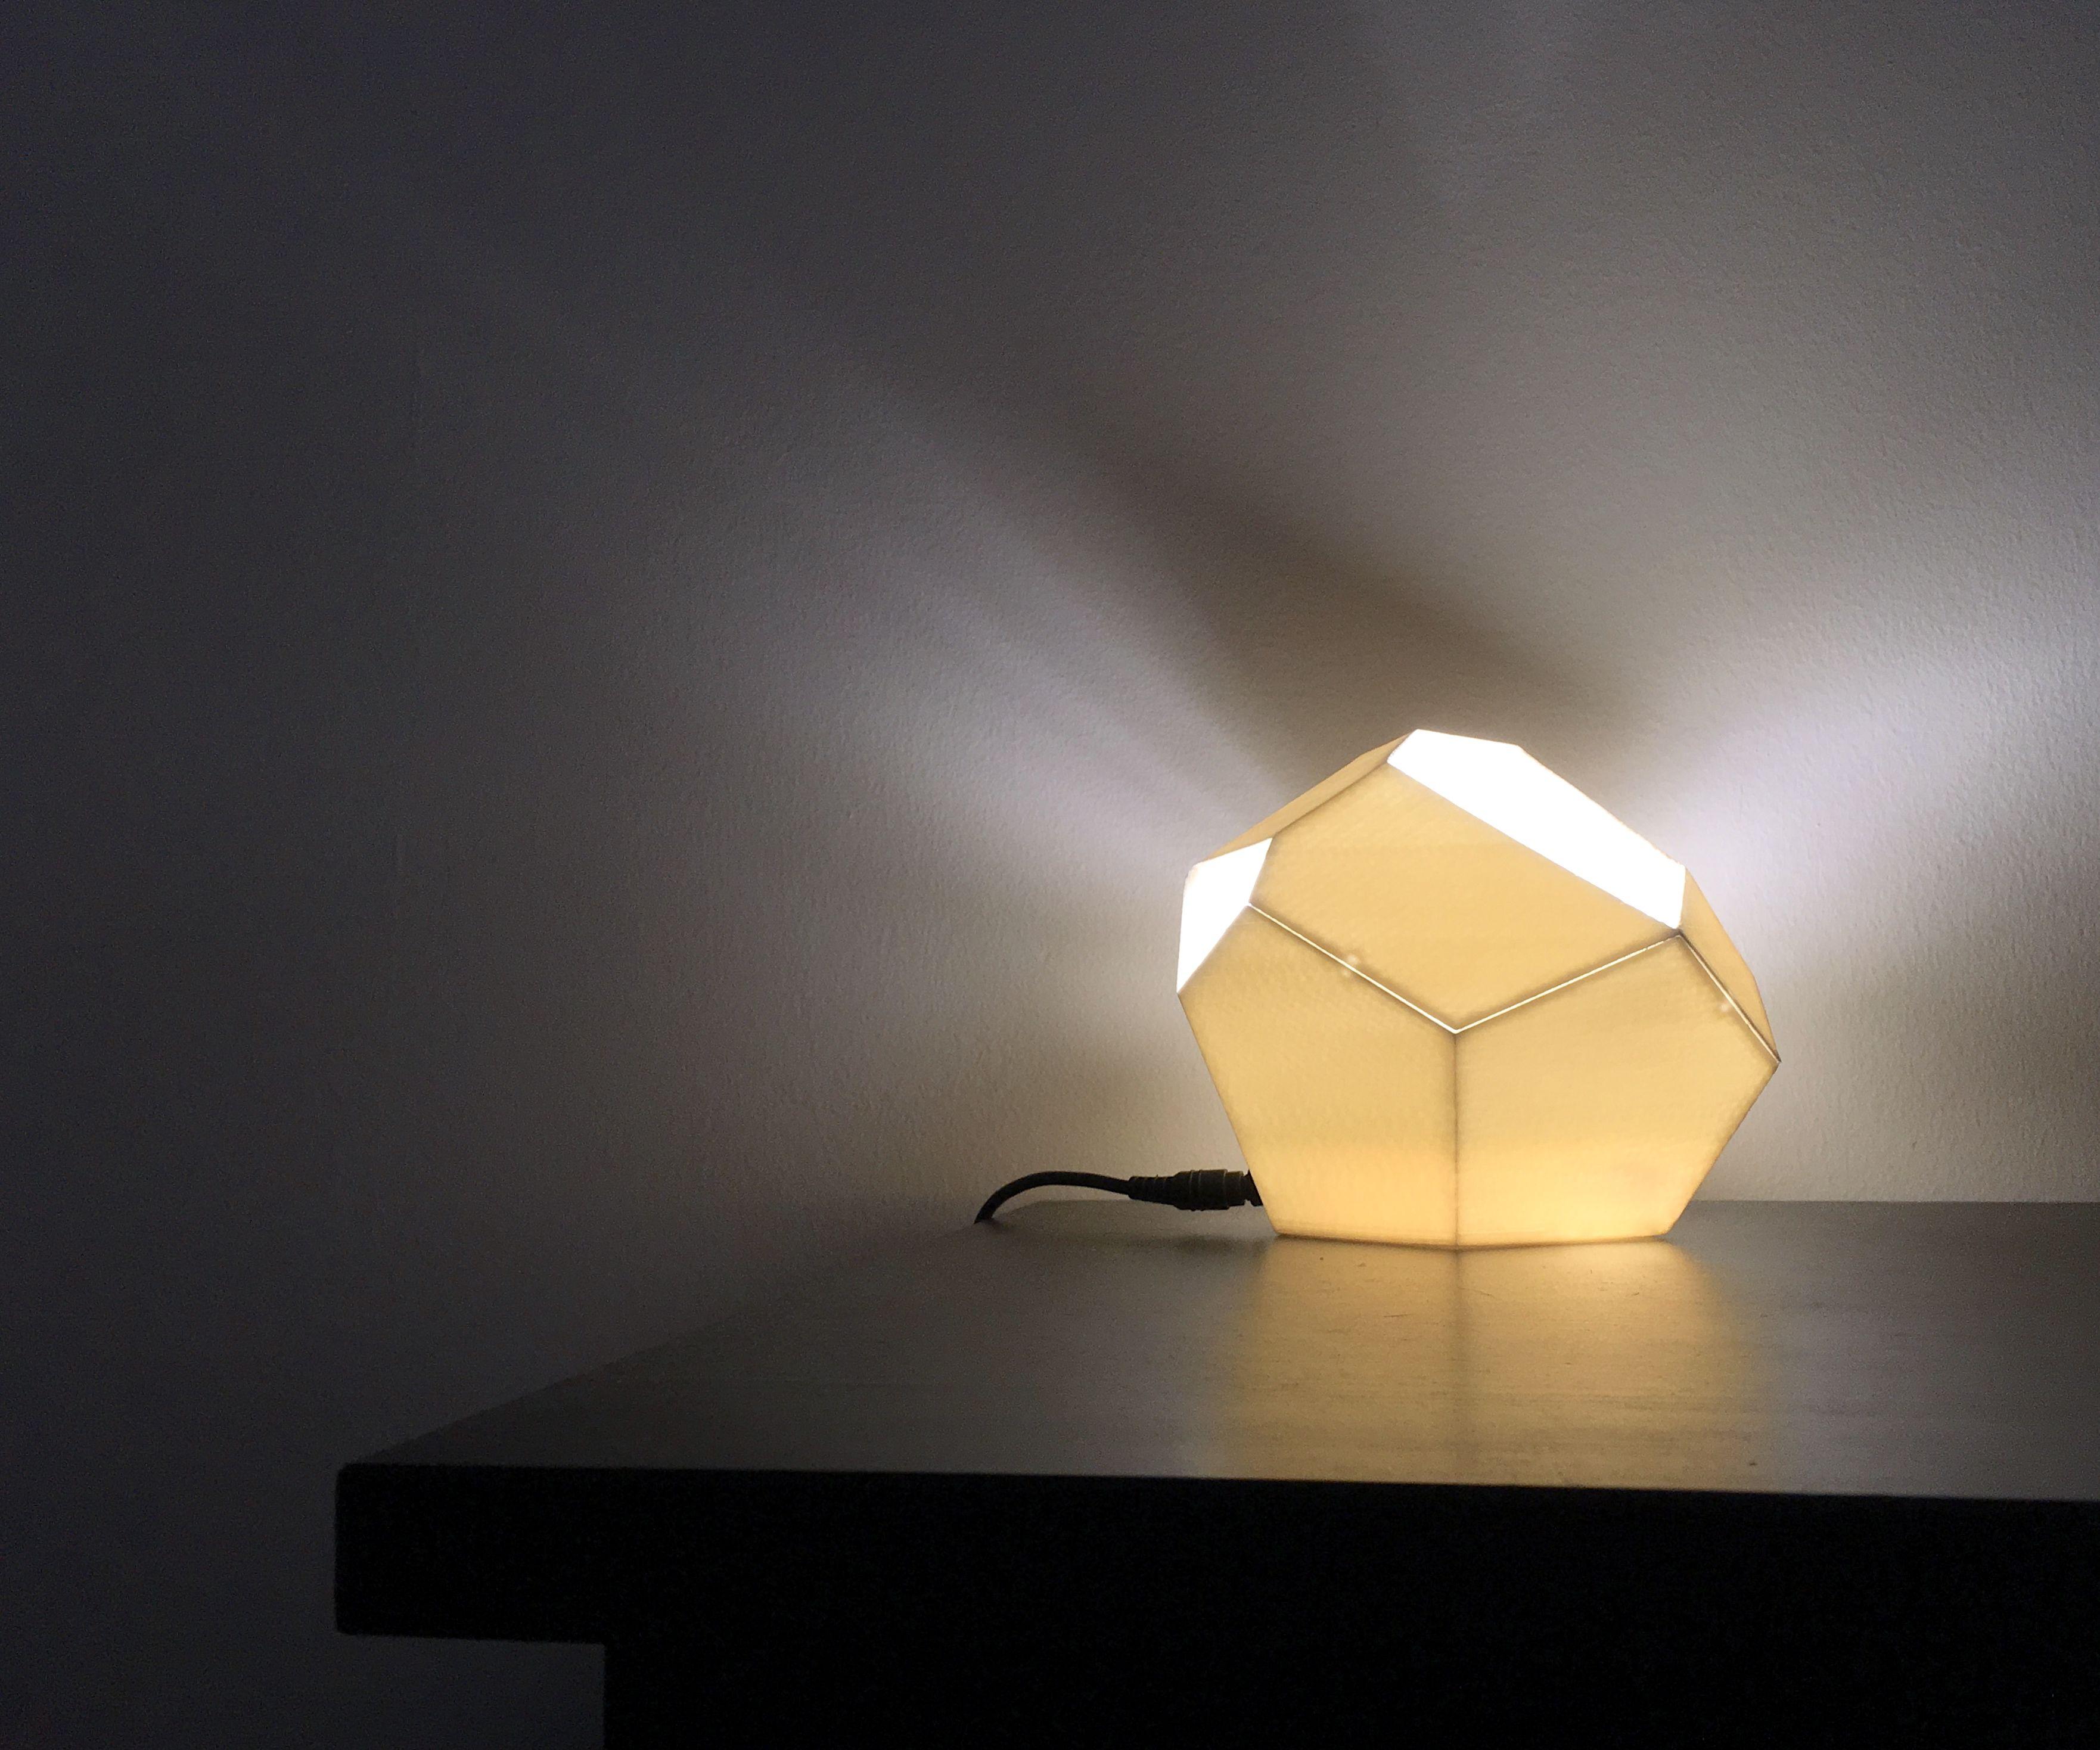 Low-Poly Geometric Desk Lamp